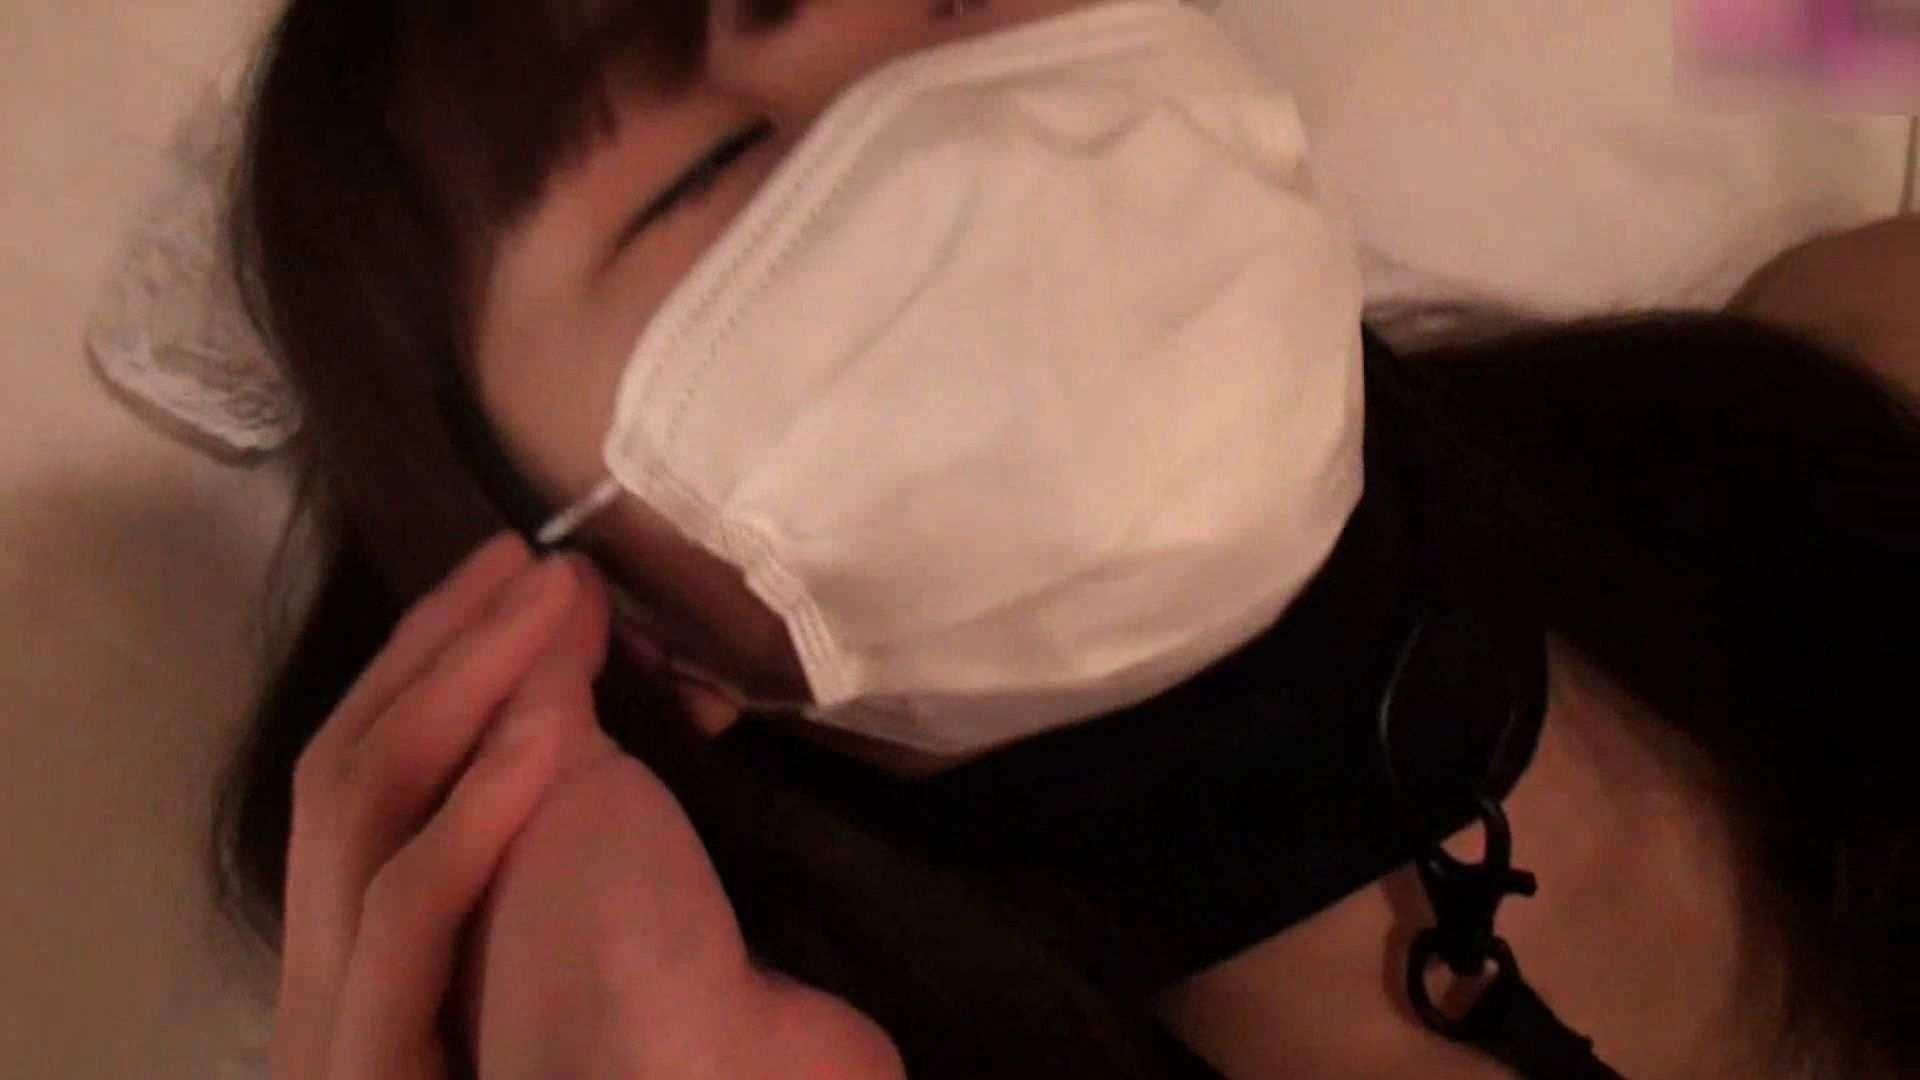 S級厳選美女ビッチガールVol.23 SEX本番 ワレメ無修正動画無料 105画像 35